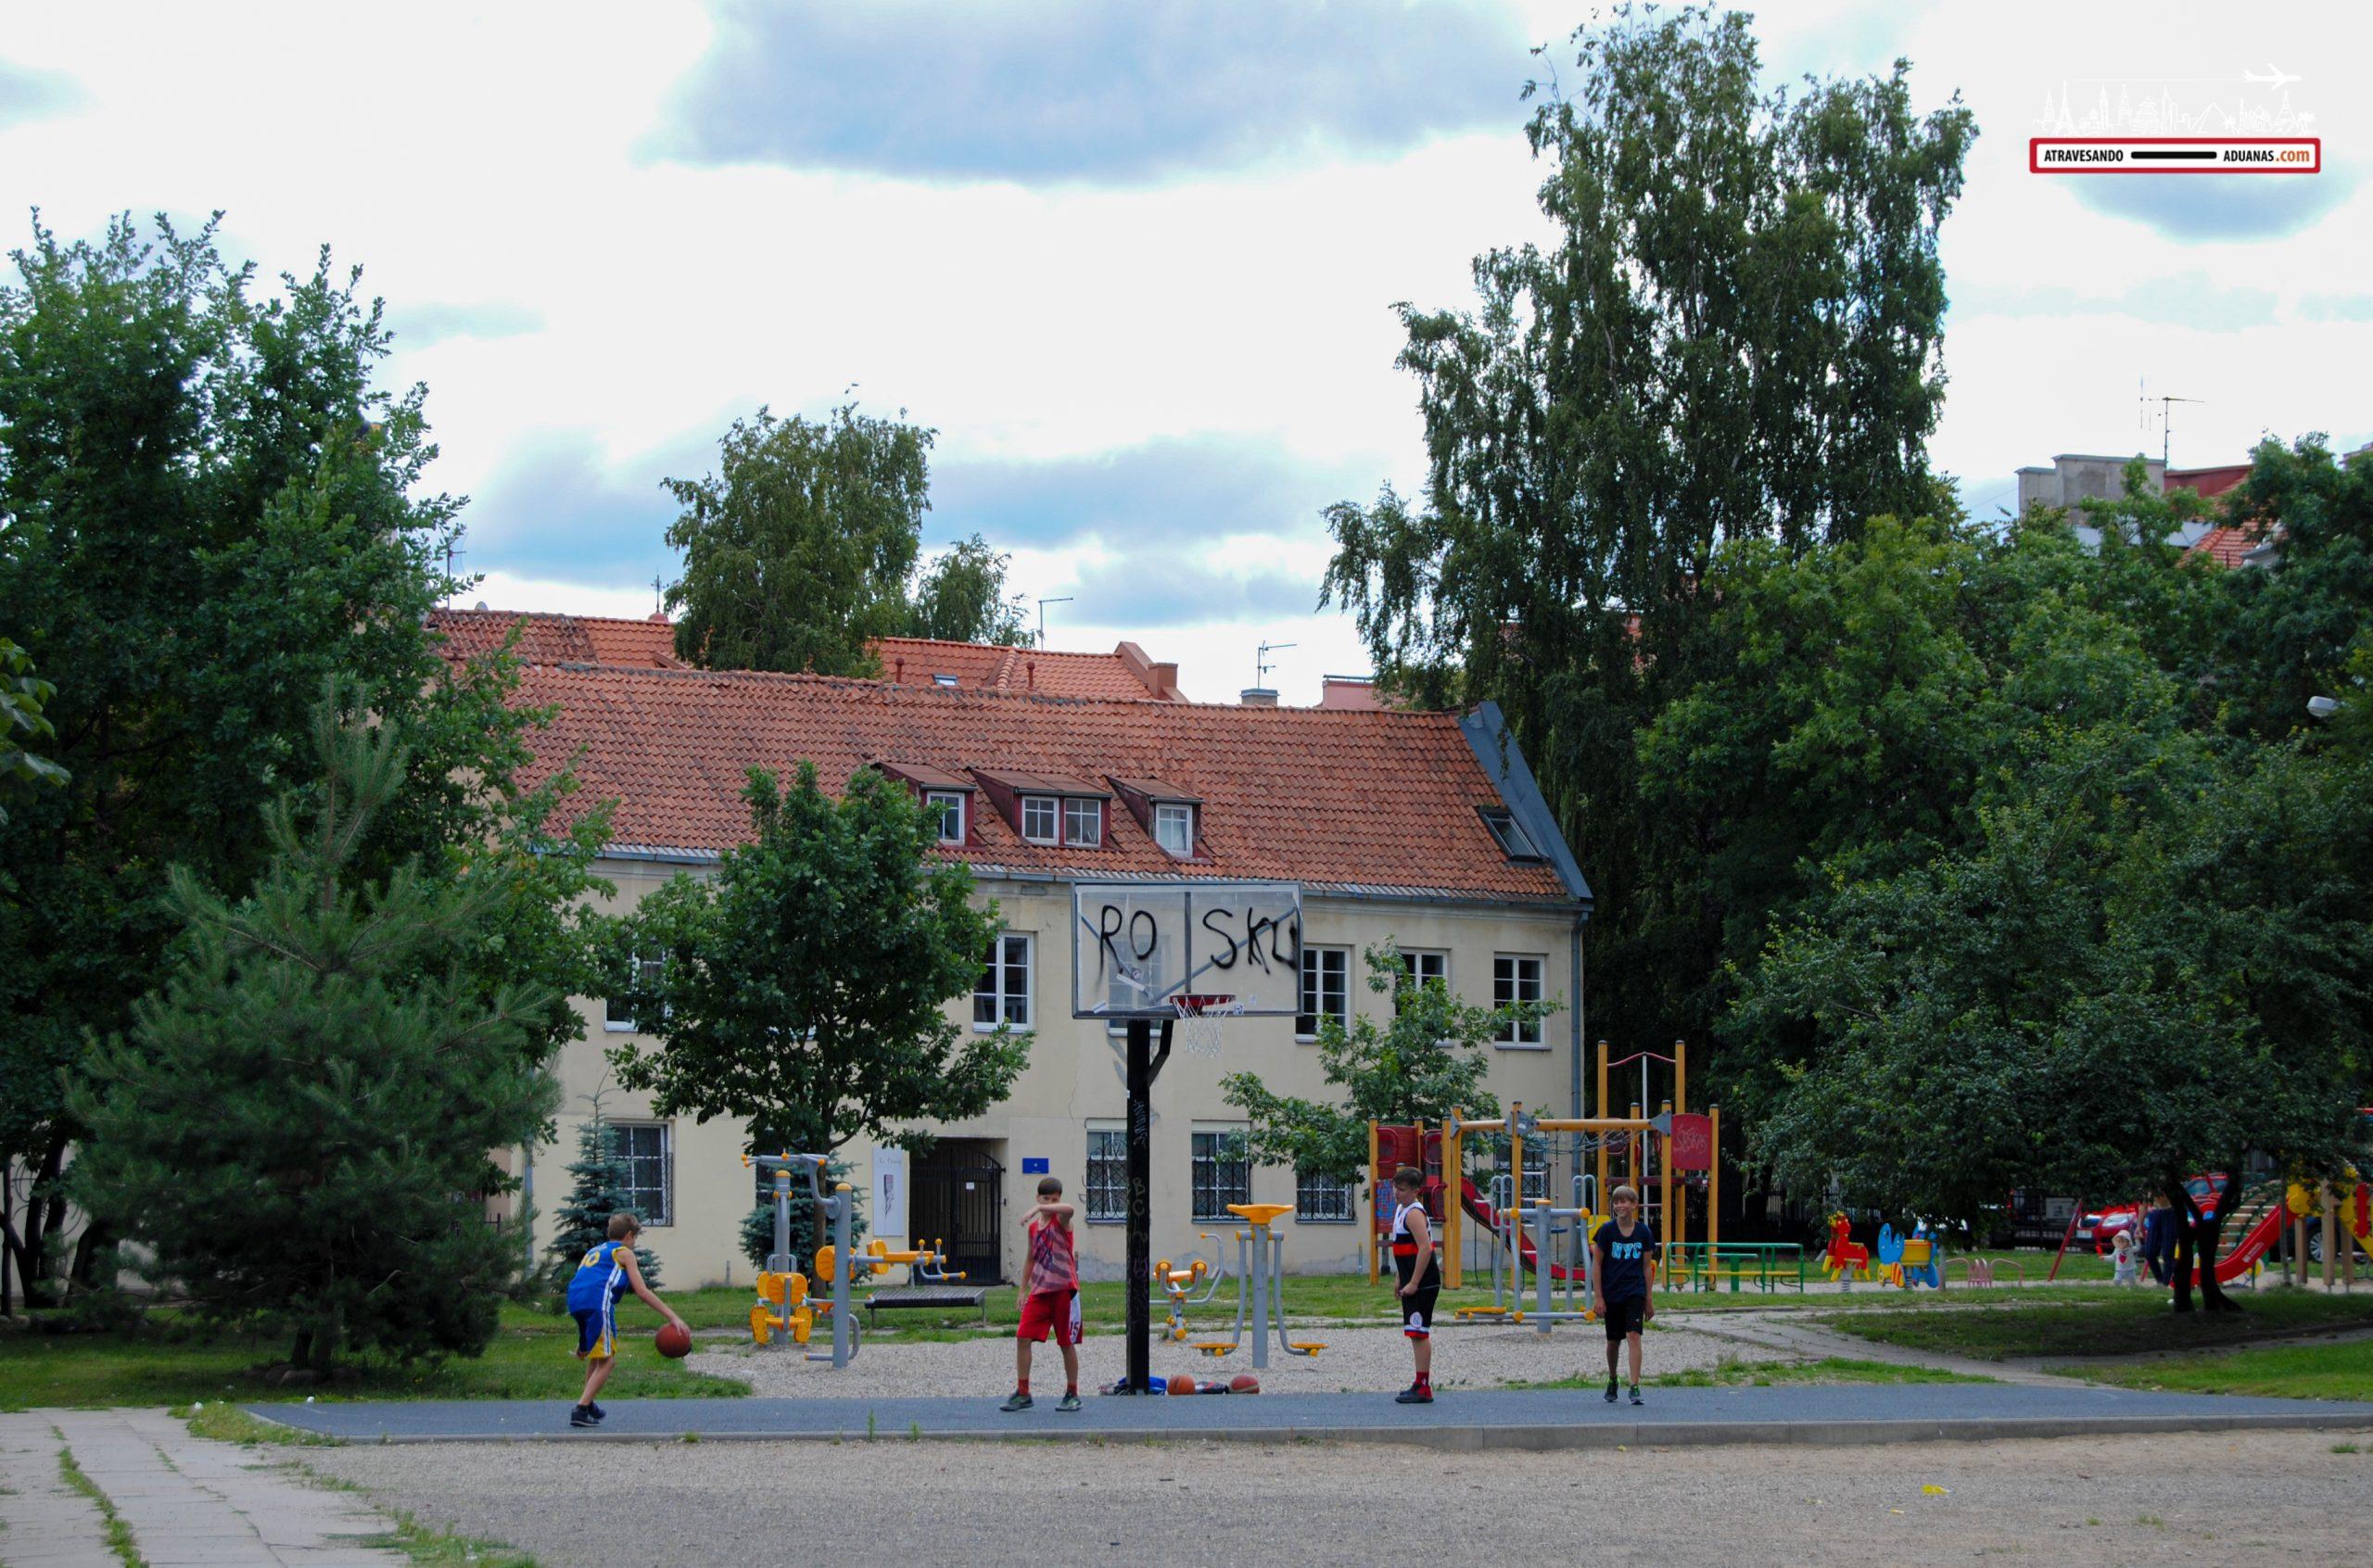 Pista de baloncesto en Vilnius